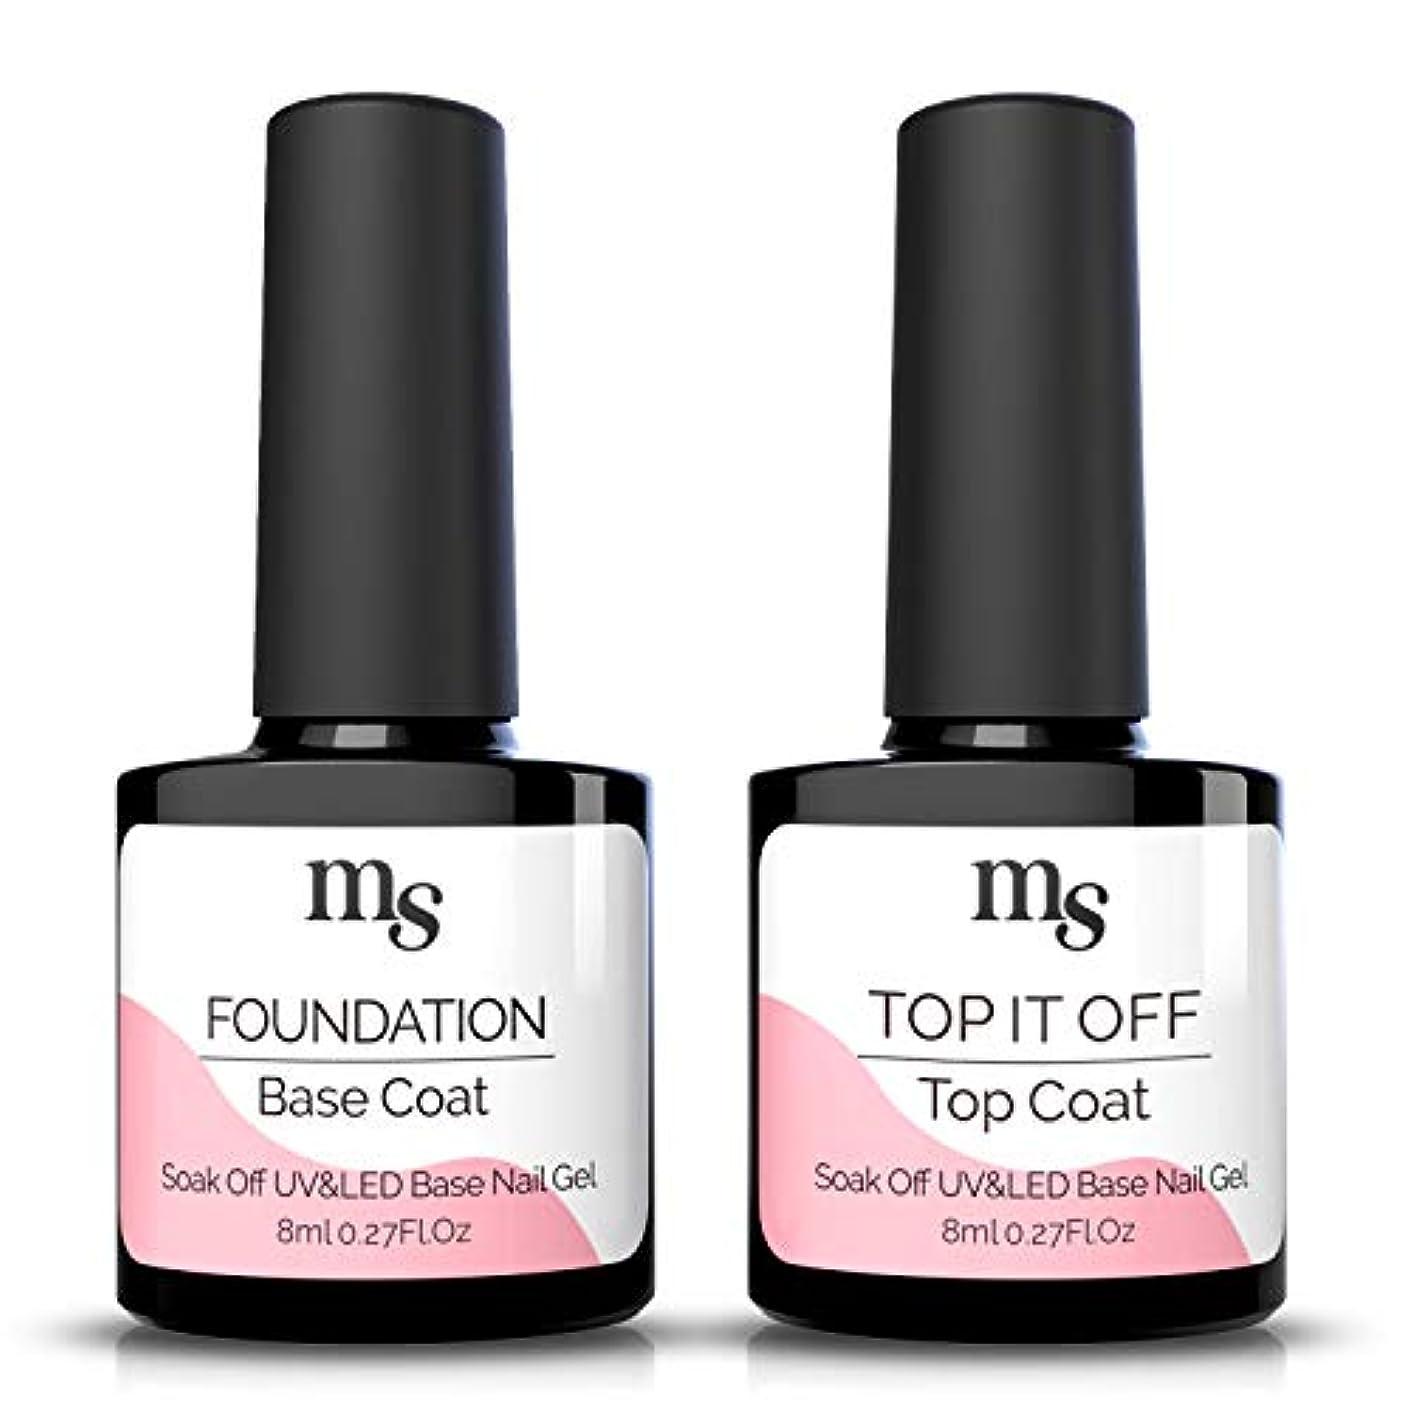 MelodySusie 2Pcs No Wipe Top and Base Coat Set UV LED Soak Off Gel Nail Polish Long Lasting Shiny Base Top Coat Polish Kit 8ml - Clear